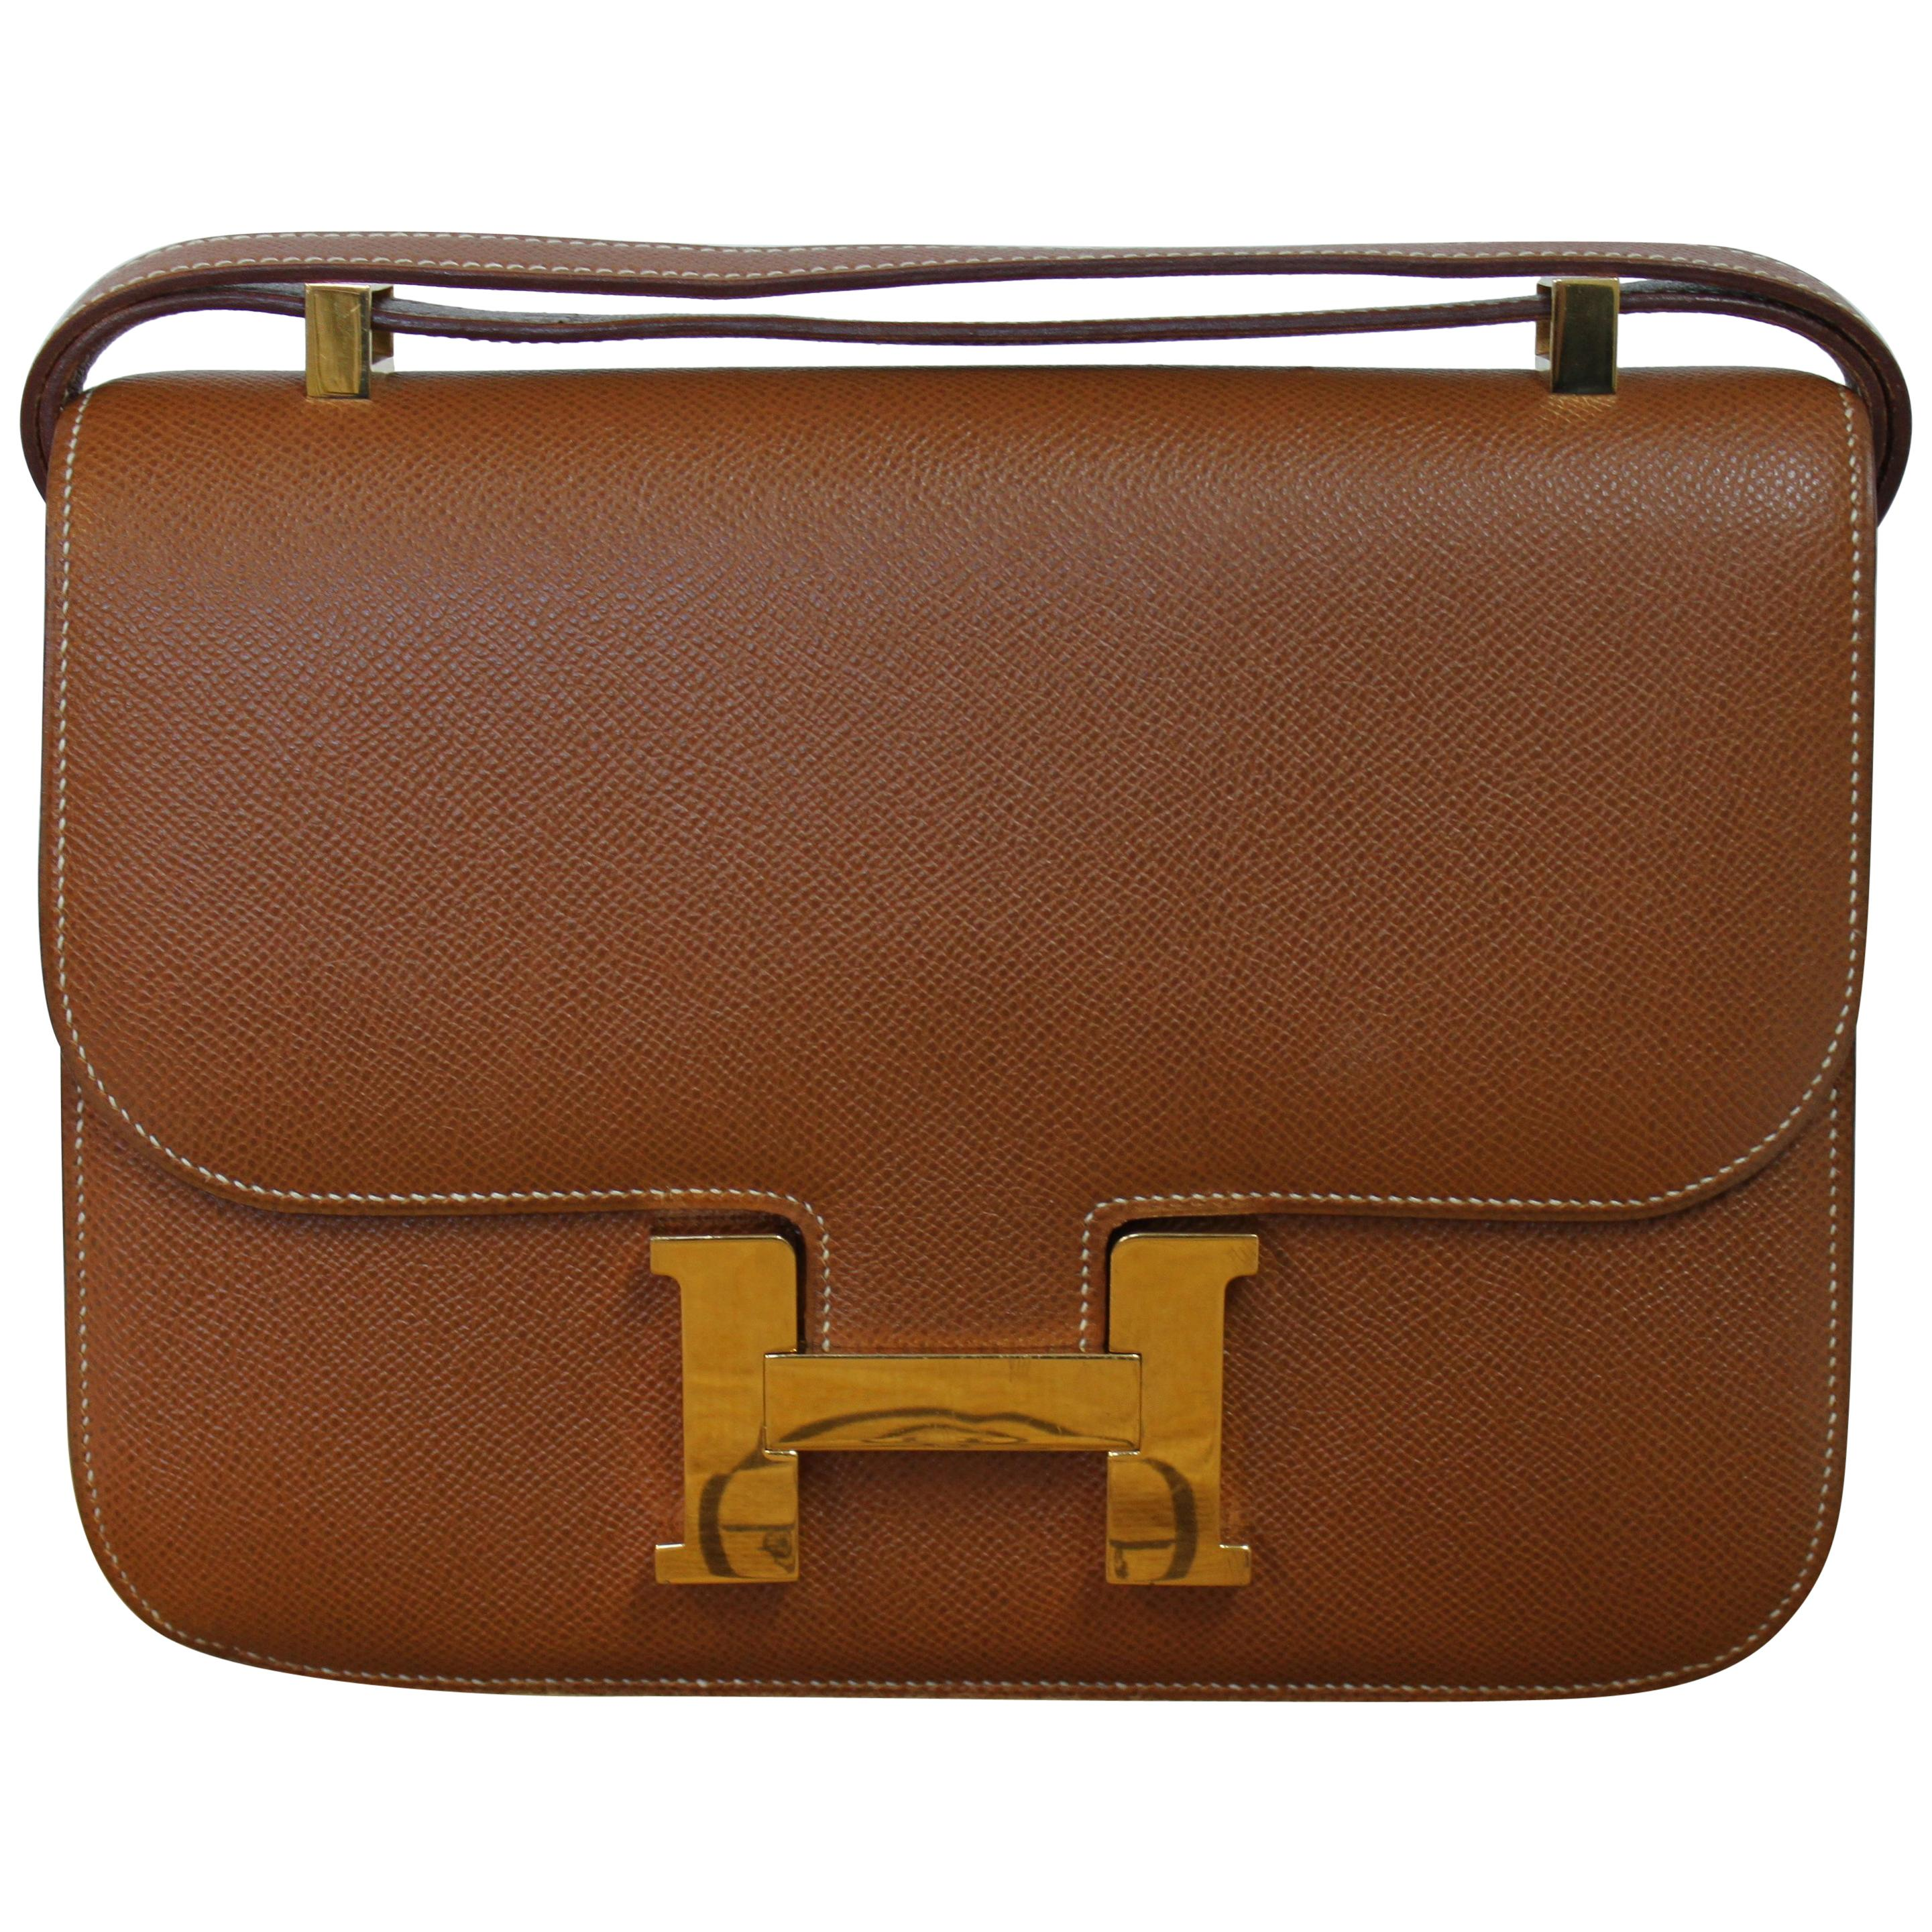 b421ed0b4926 Hermes Constance 24 Shoulder Bag brown tan epsom leather with gold .